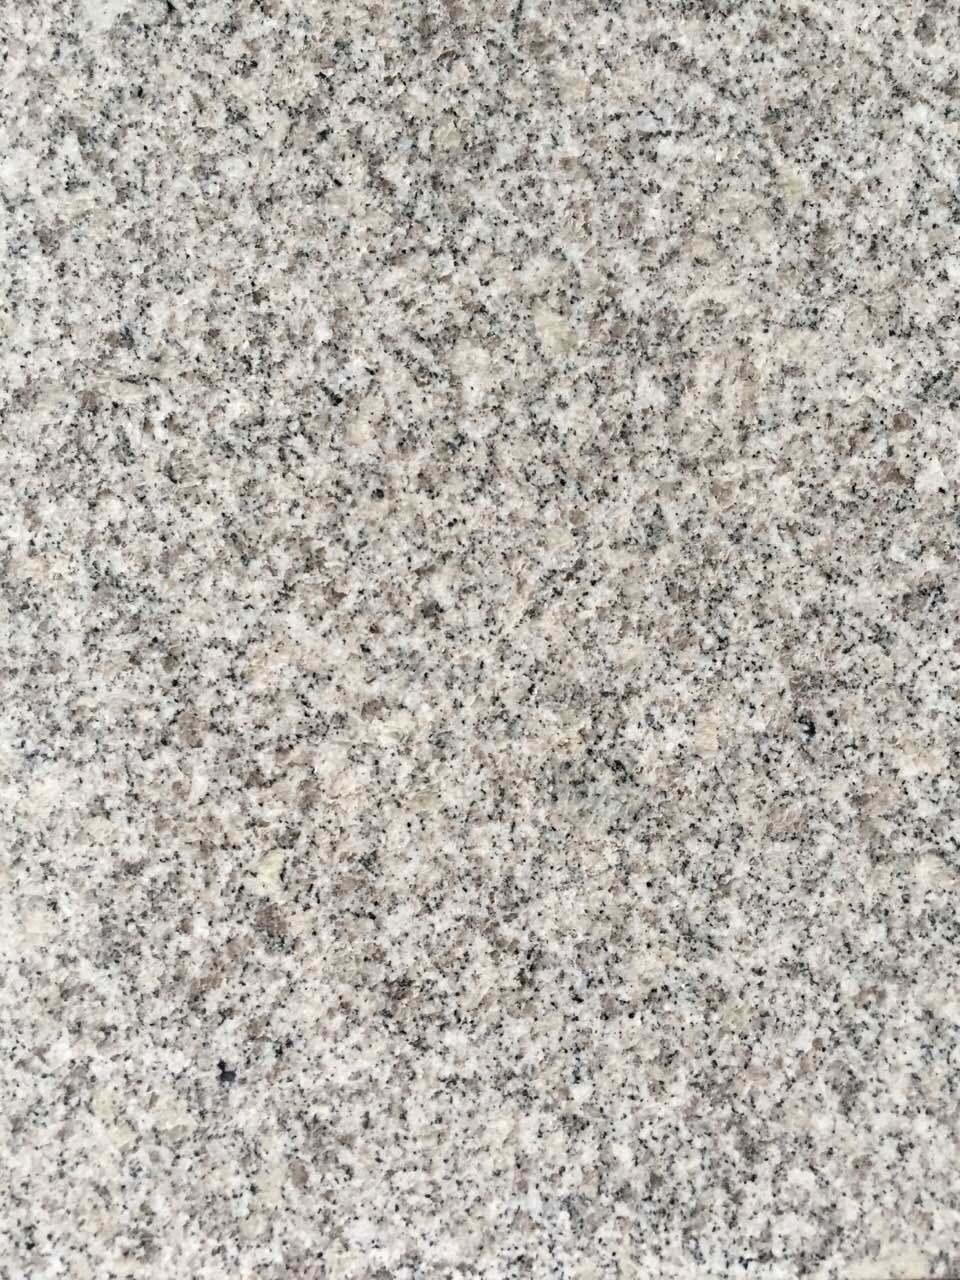 Natural Granite G603 Slab for Worktop & Tiles